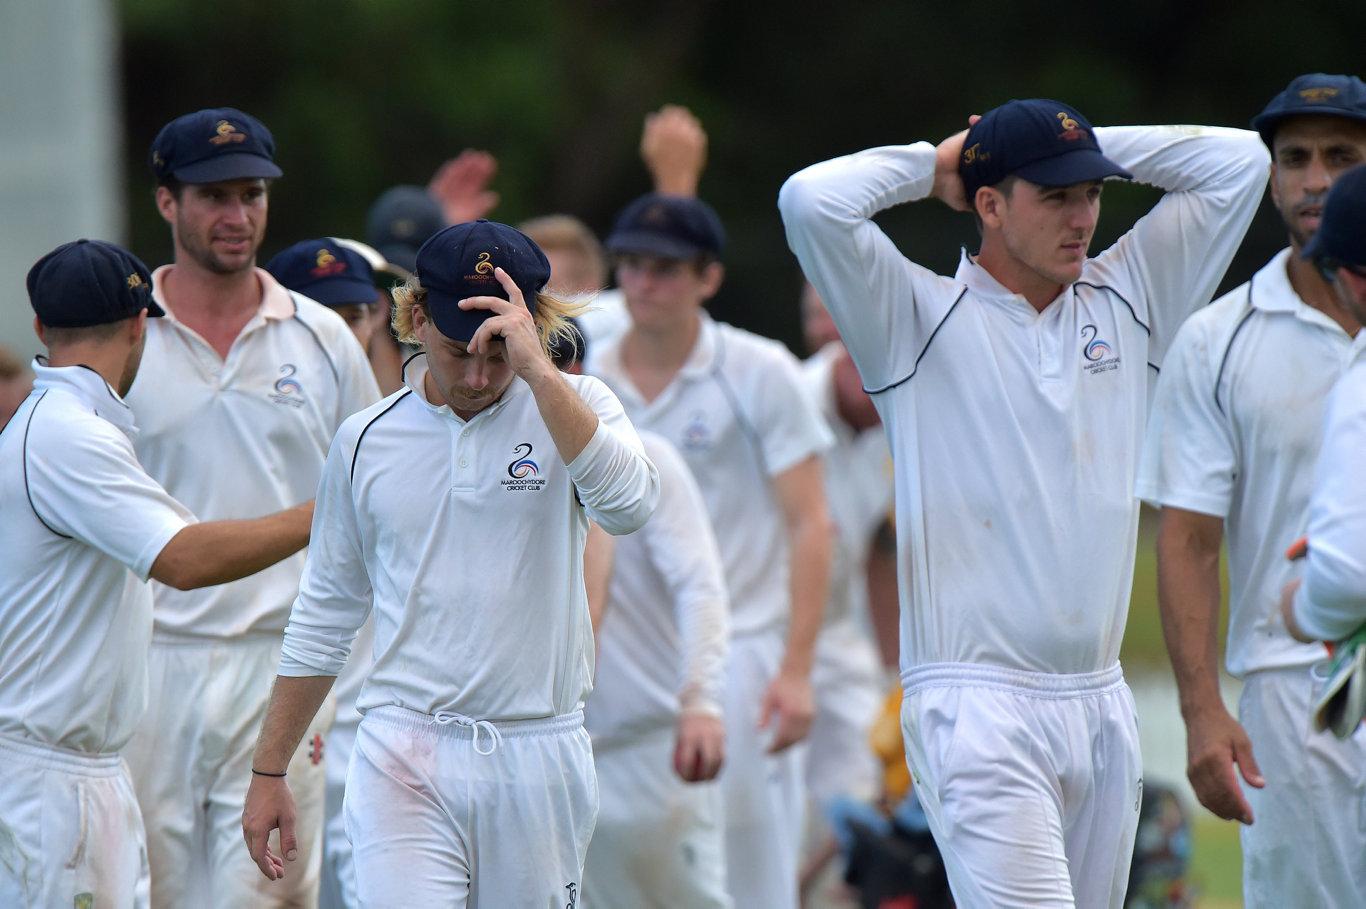 Maroochydore Blue against Gympie cricket grand final. Maroochydore Blue fell short Photo: Warren Lynam / Sunshine Coast Daily